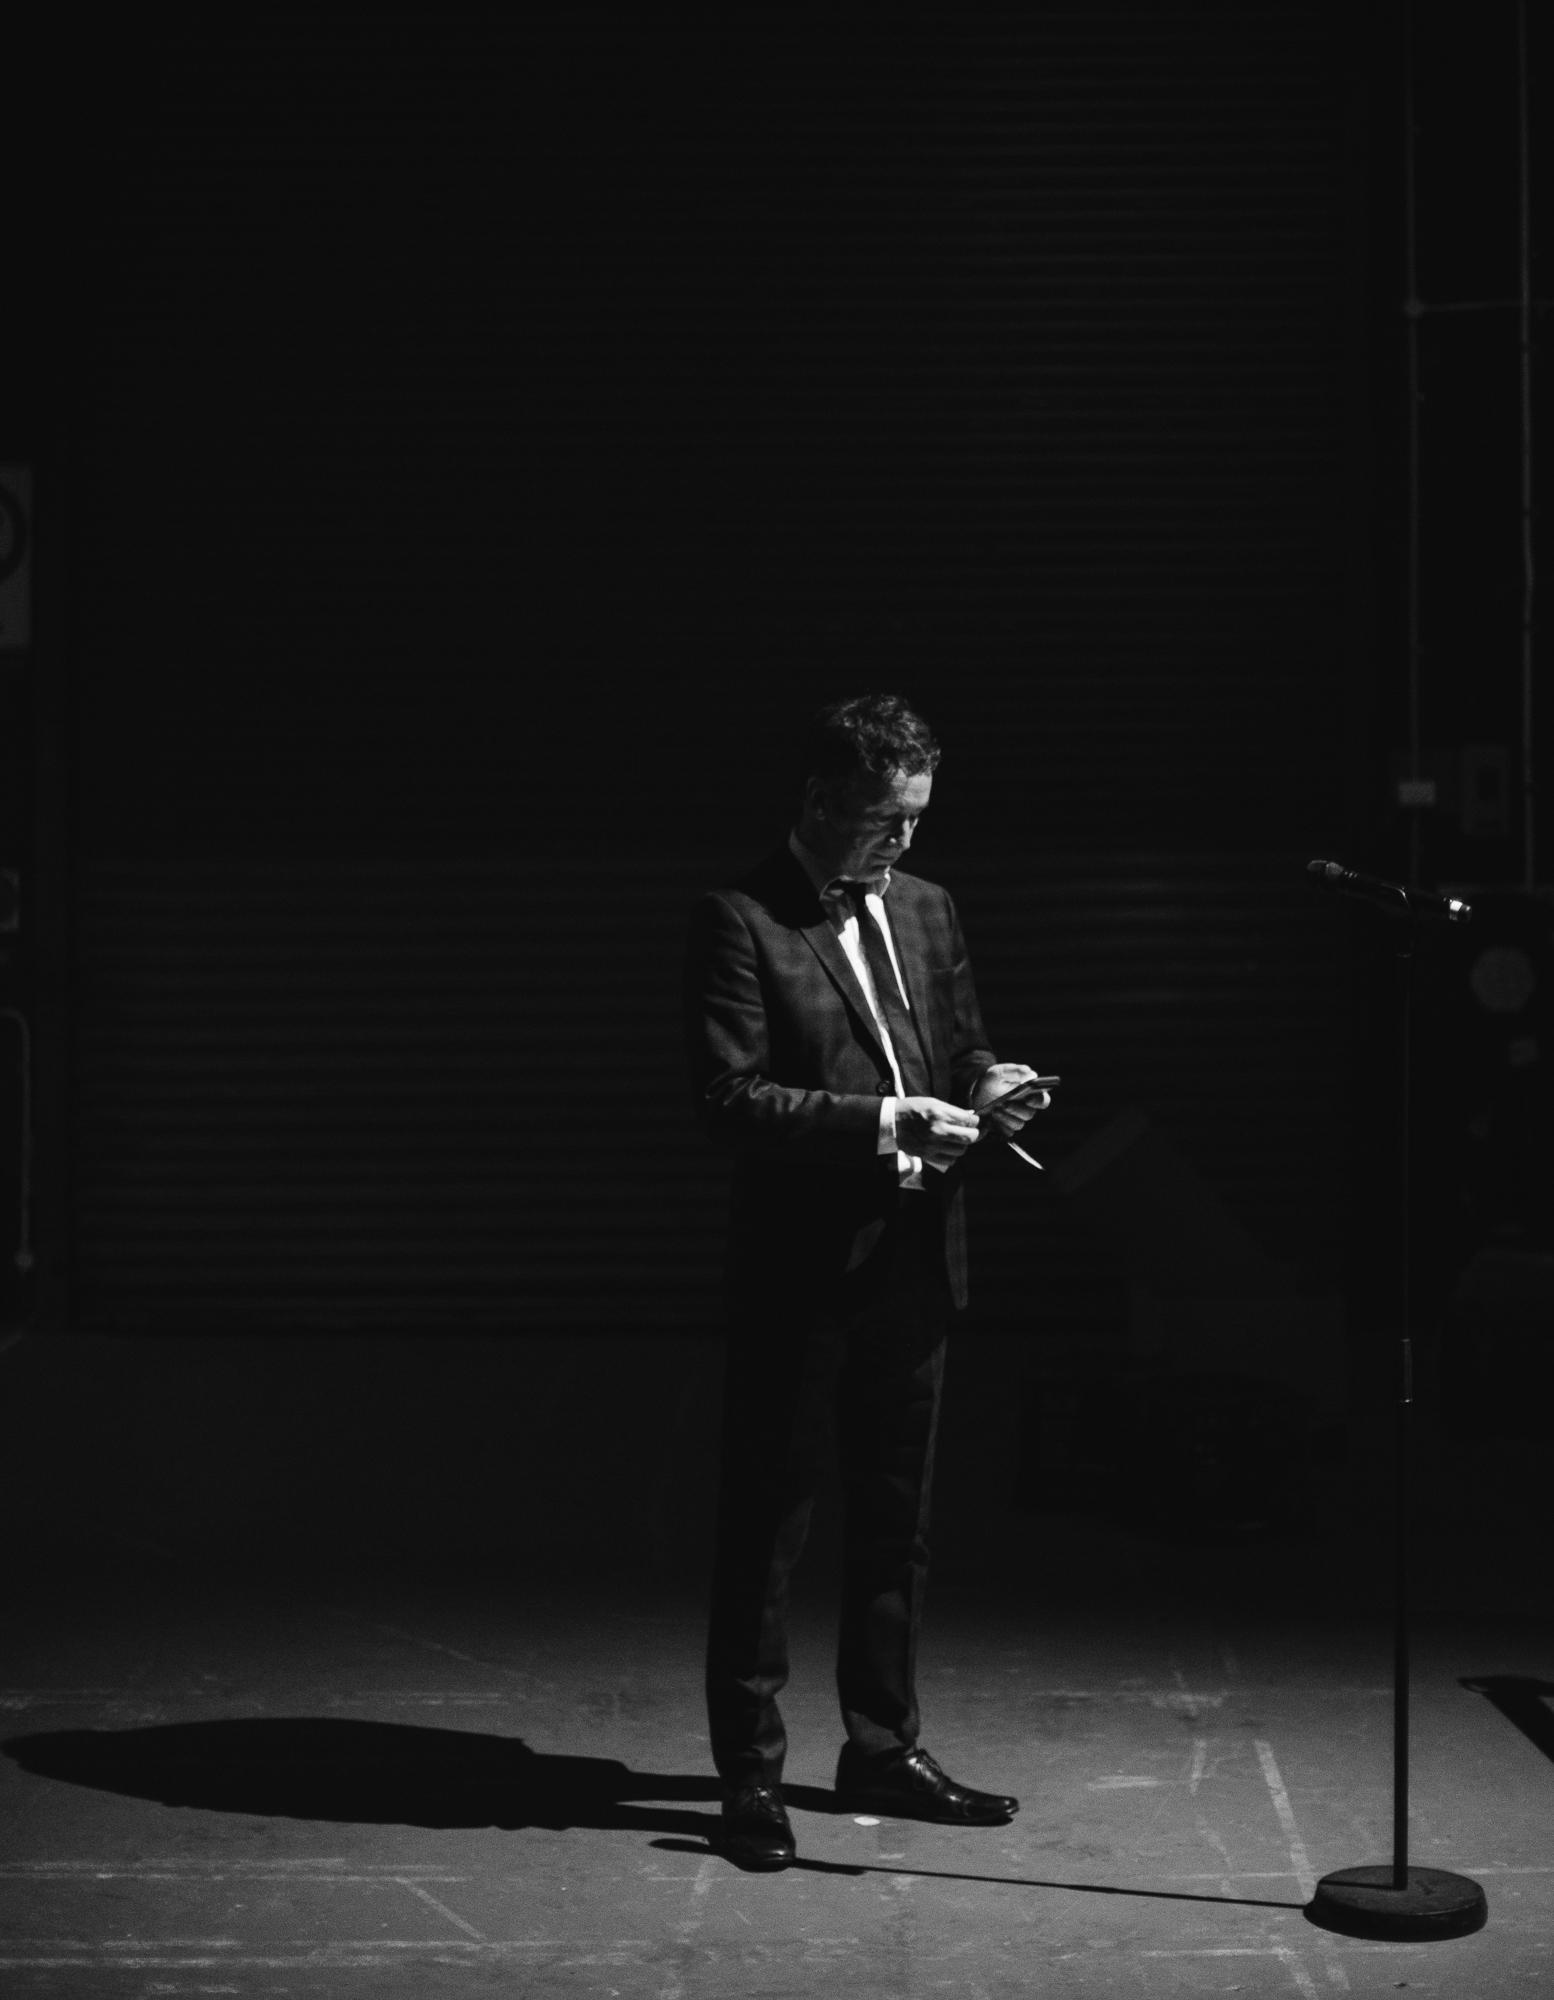 Jeff Green, 2016